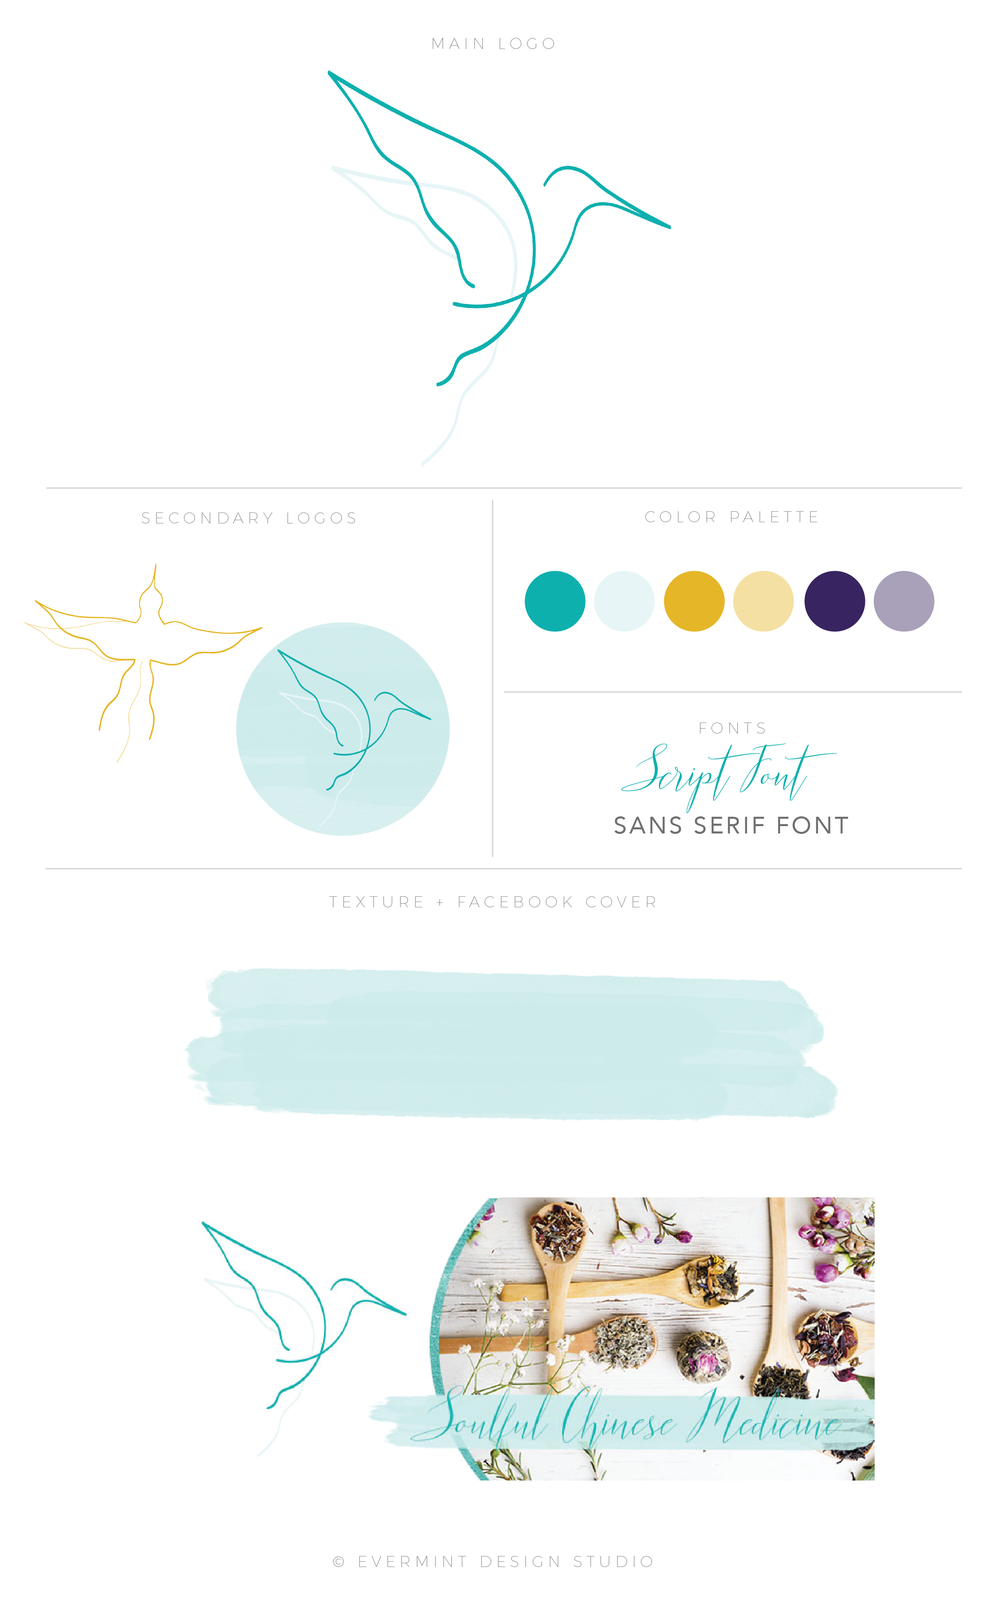 Hummingbird Acupuncture Brand Identity Design - Minot, ND